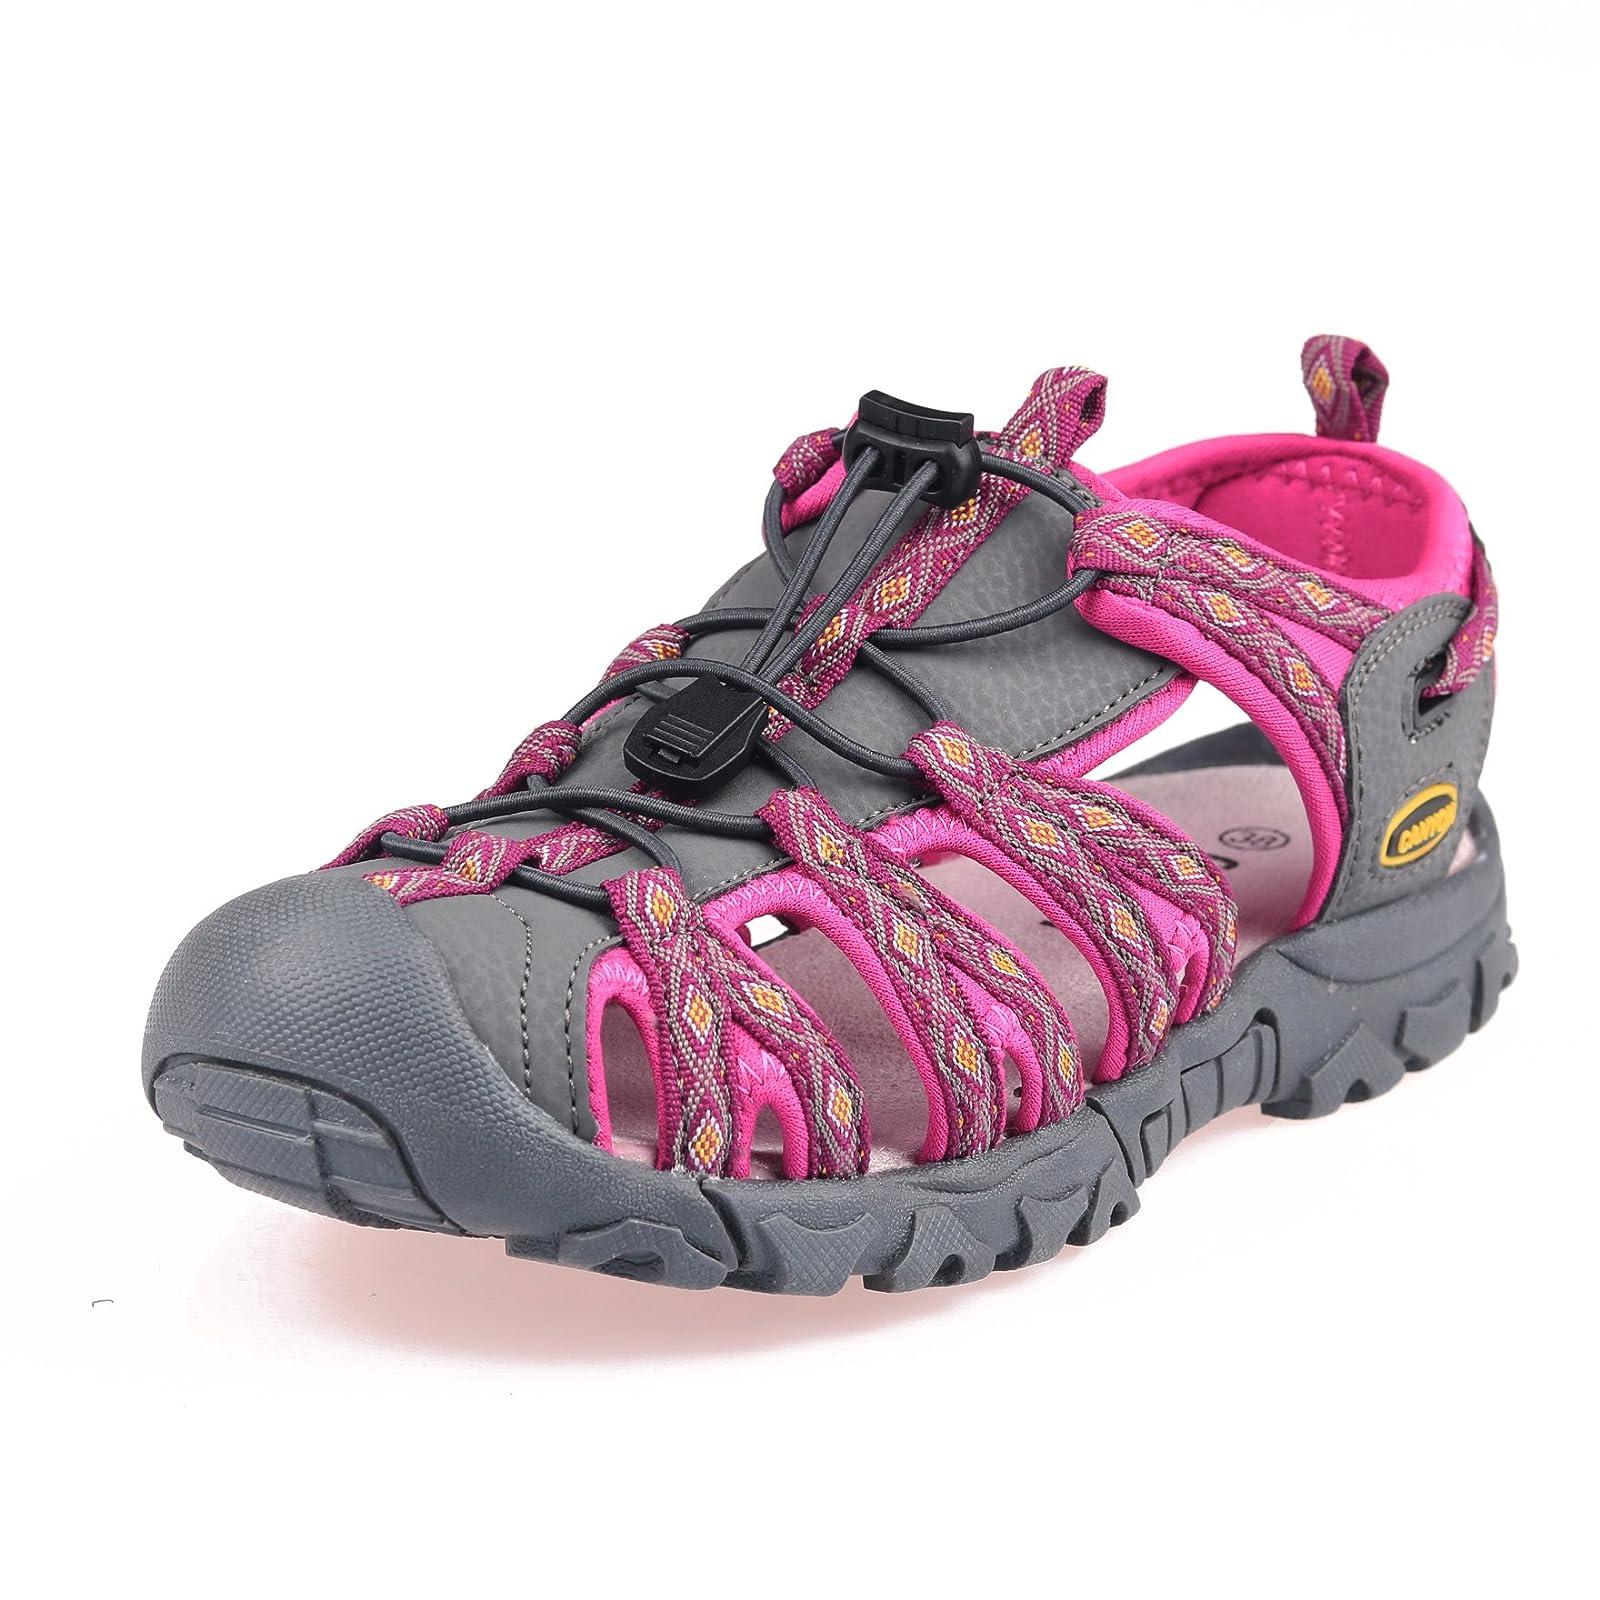 GRITION Women Outdoor Summer Sandals Adjustable Closed - 8